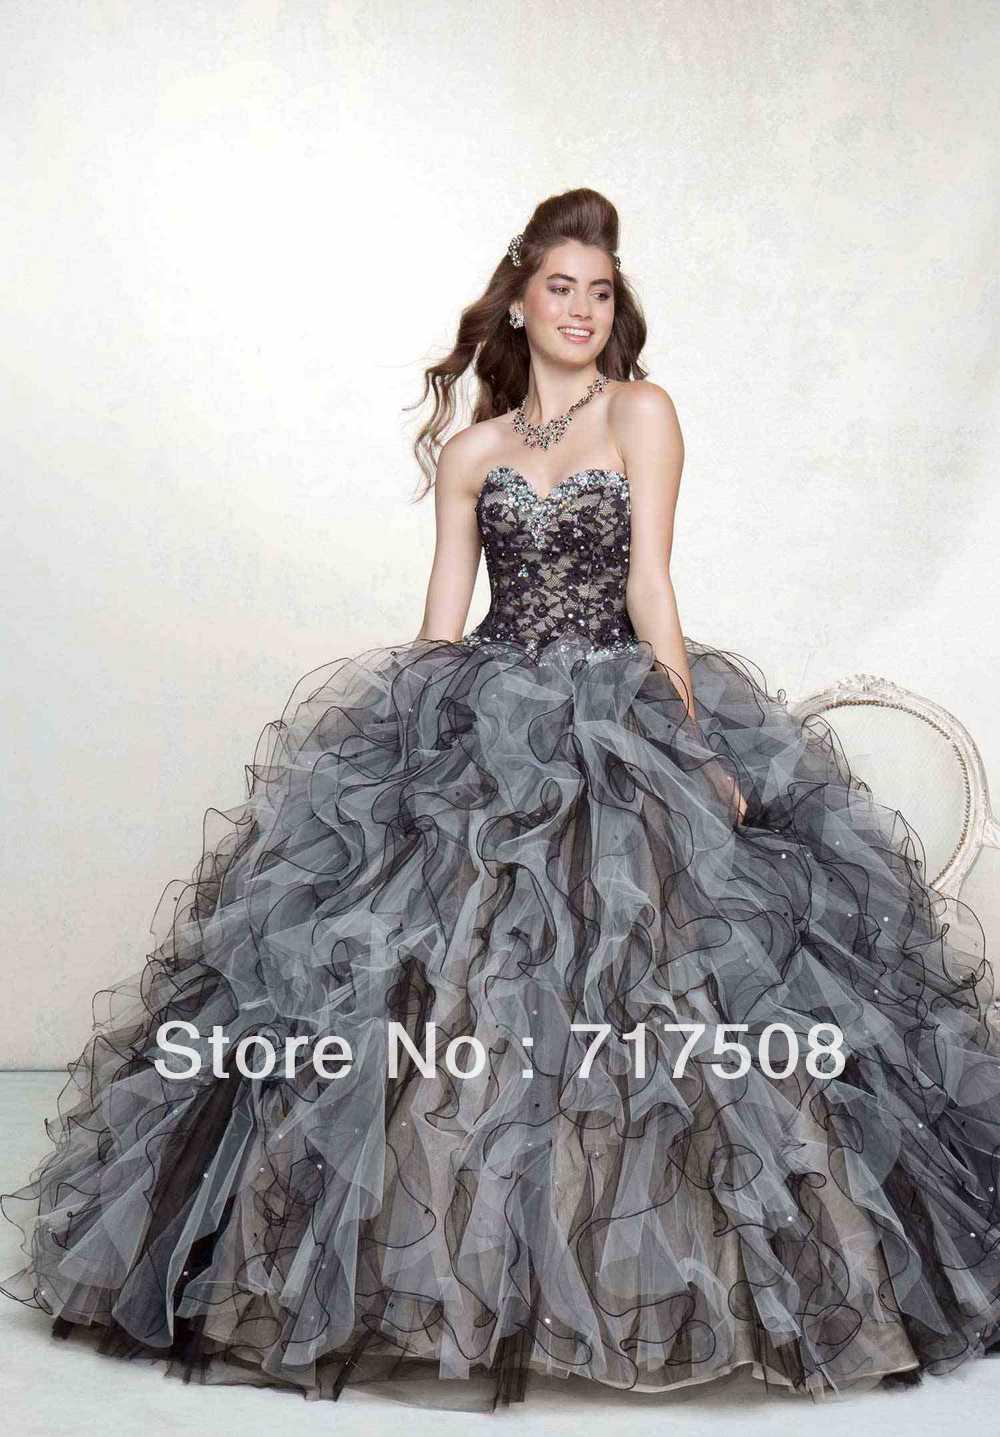 Unique And Beautiful Prom Dresses 112